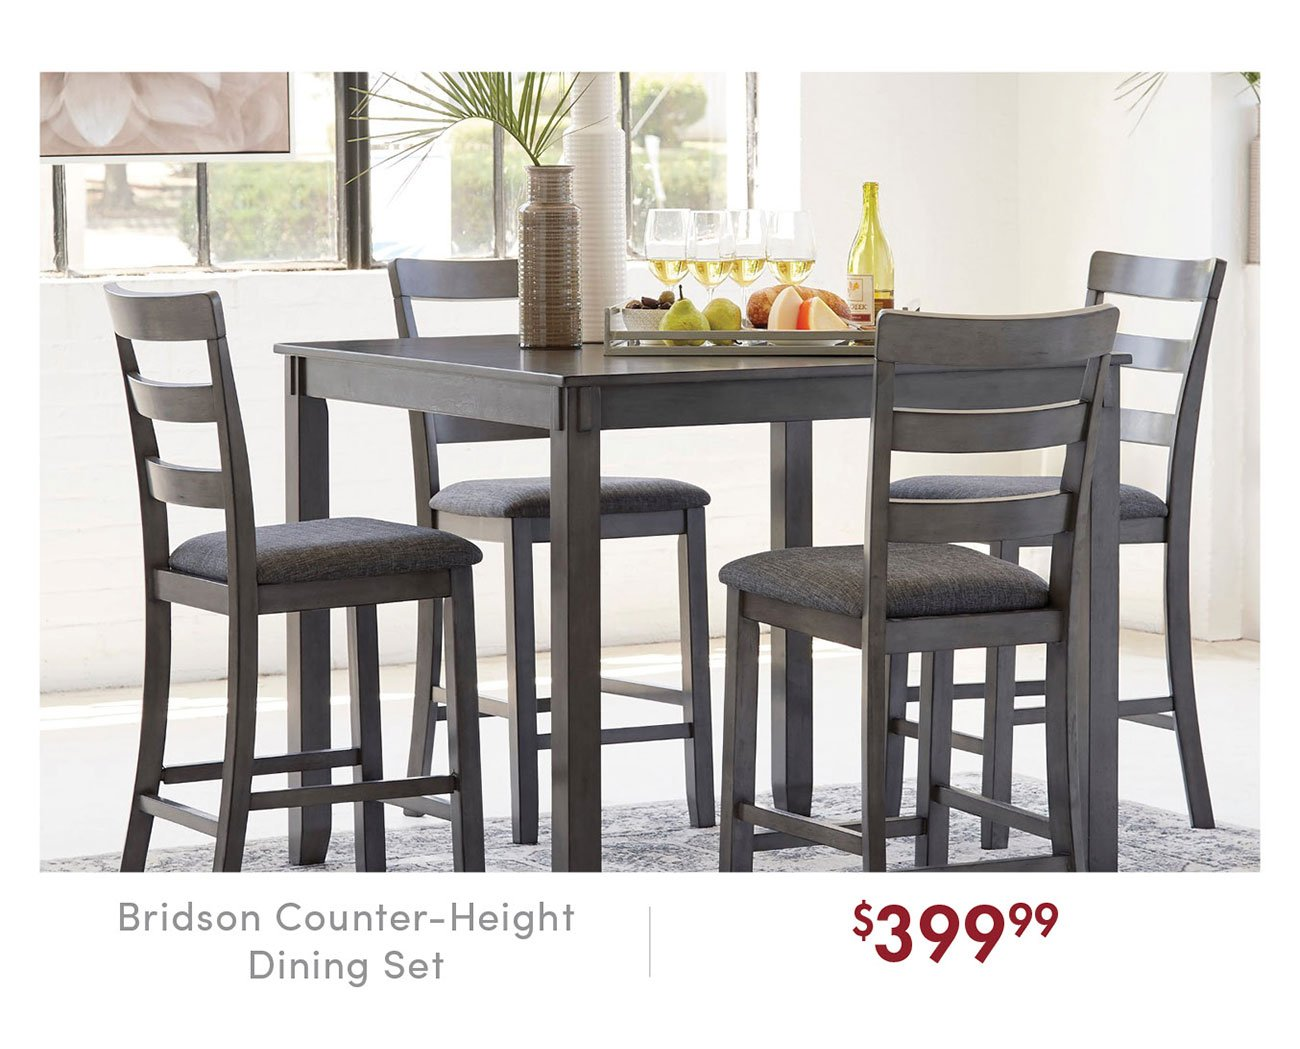 Bridson-dining-set